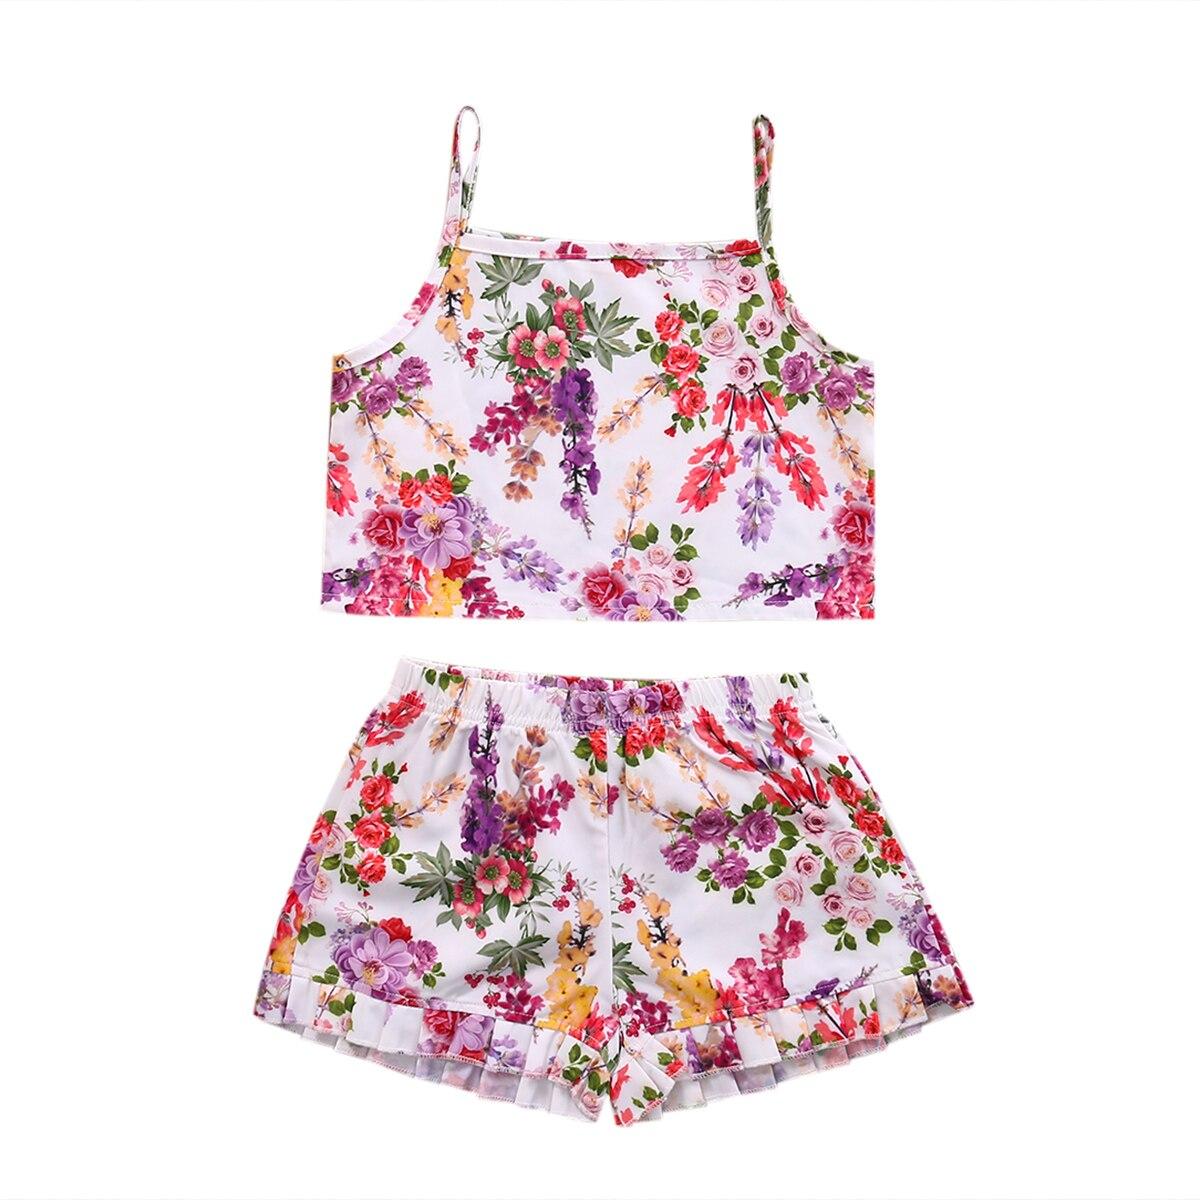 2Pcs Sets Kids Baby Girls Clothes Floral Tank Vest T-shirts+Short Pants Bottoms Summer Kids Girls Cute Suits baby girls summer suits sleeveless vest shirt cute floral harem pants floral sets